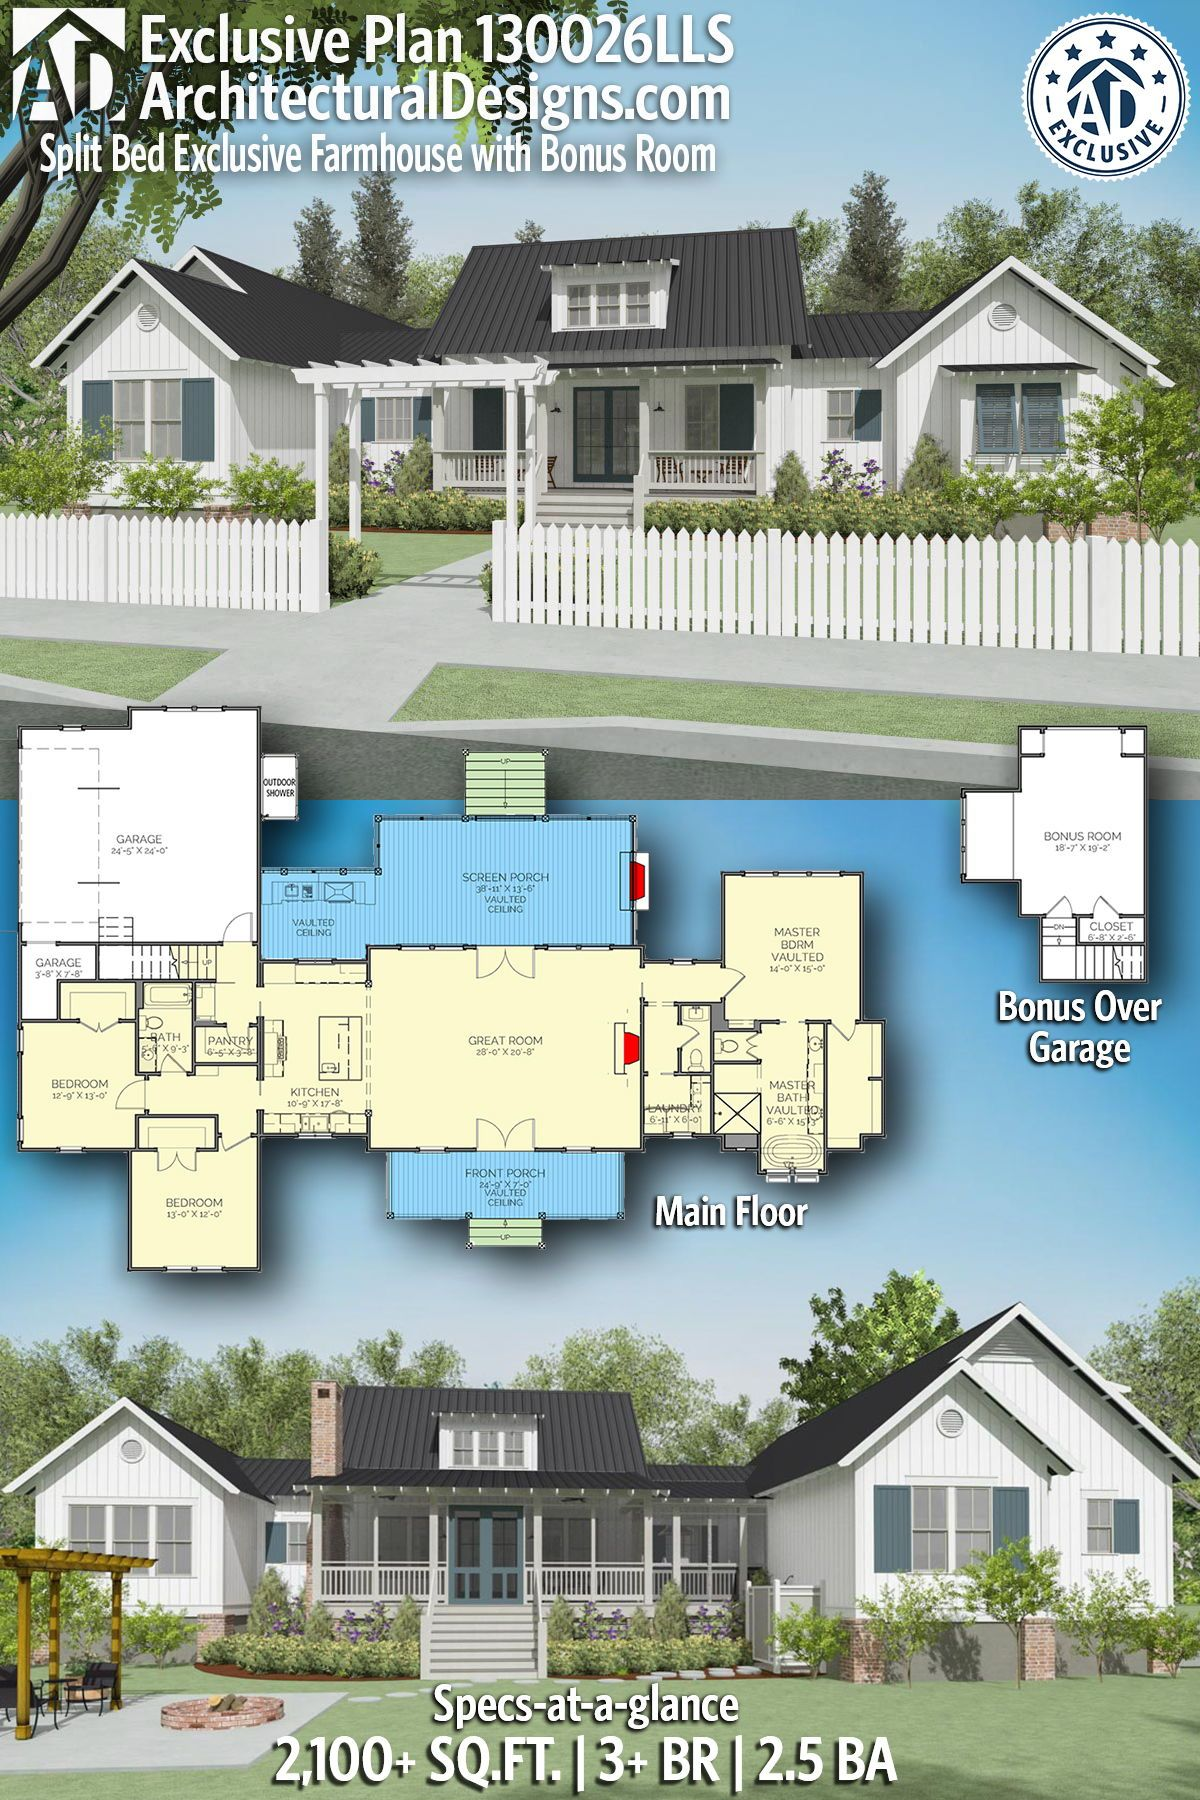 Architectural Designs Exclusive Modern Farmhouse Plan 130026LLS